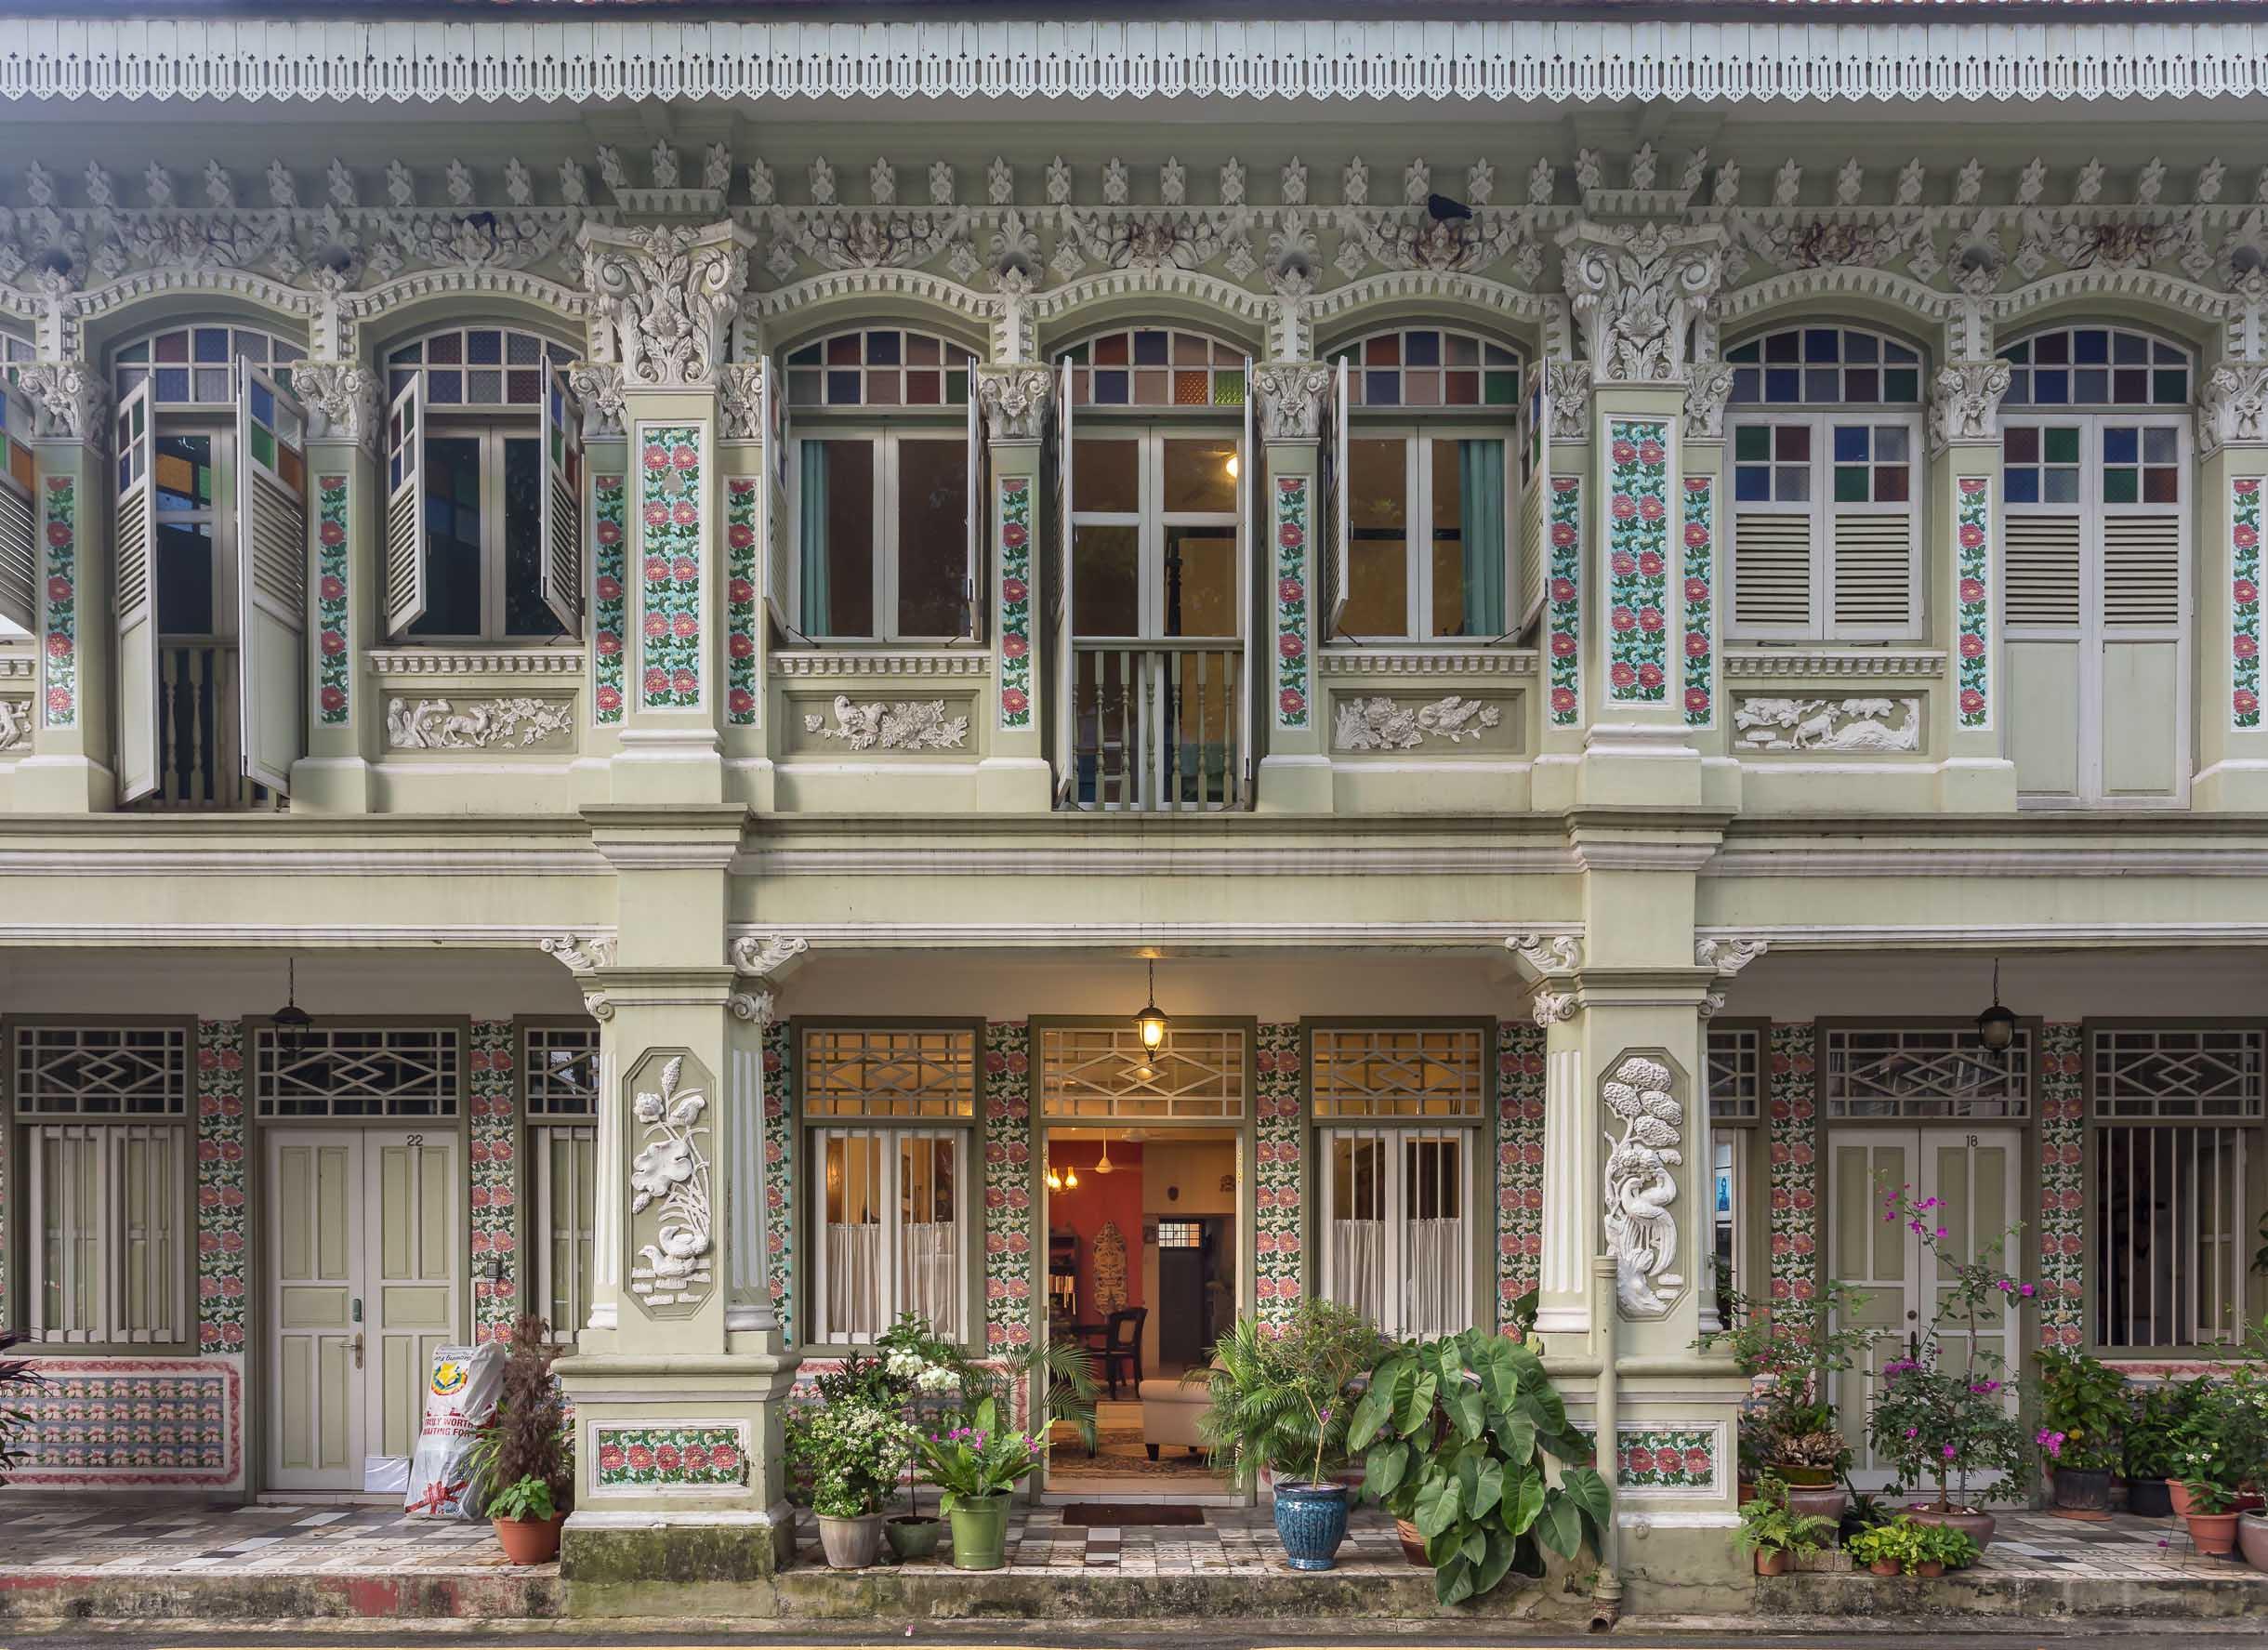 Interiors We love l A Heritage Shophouse l The Past Perfect Collection l Singapore